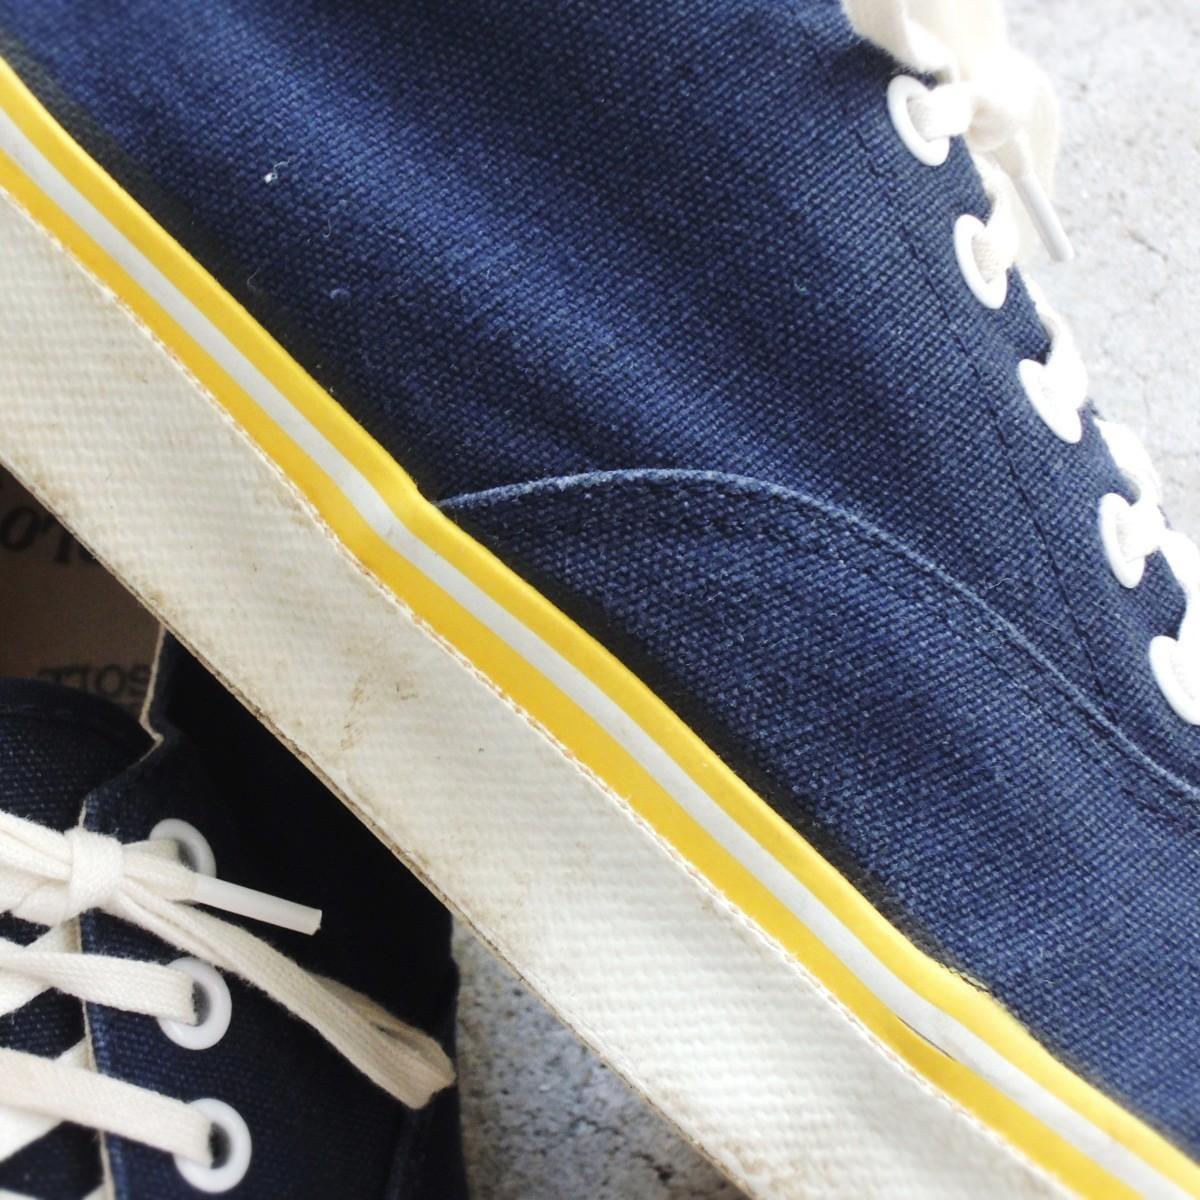 ralphlaurencanvasshoes02.JPG